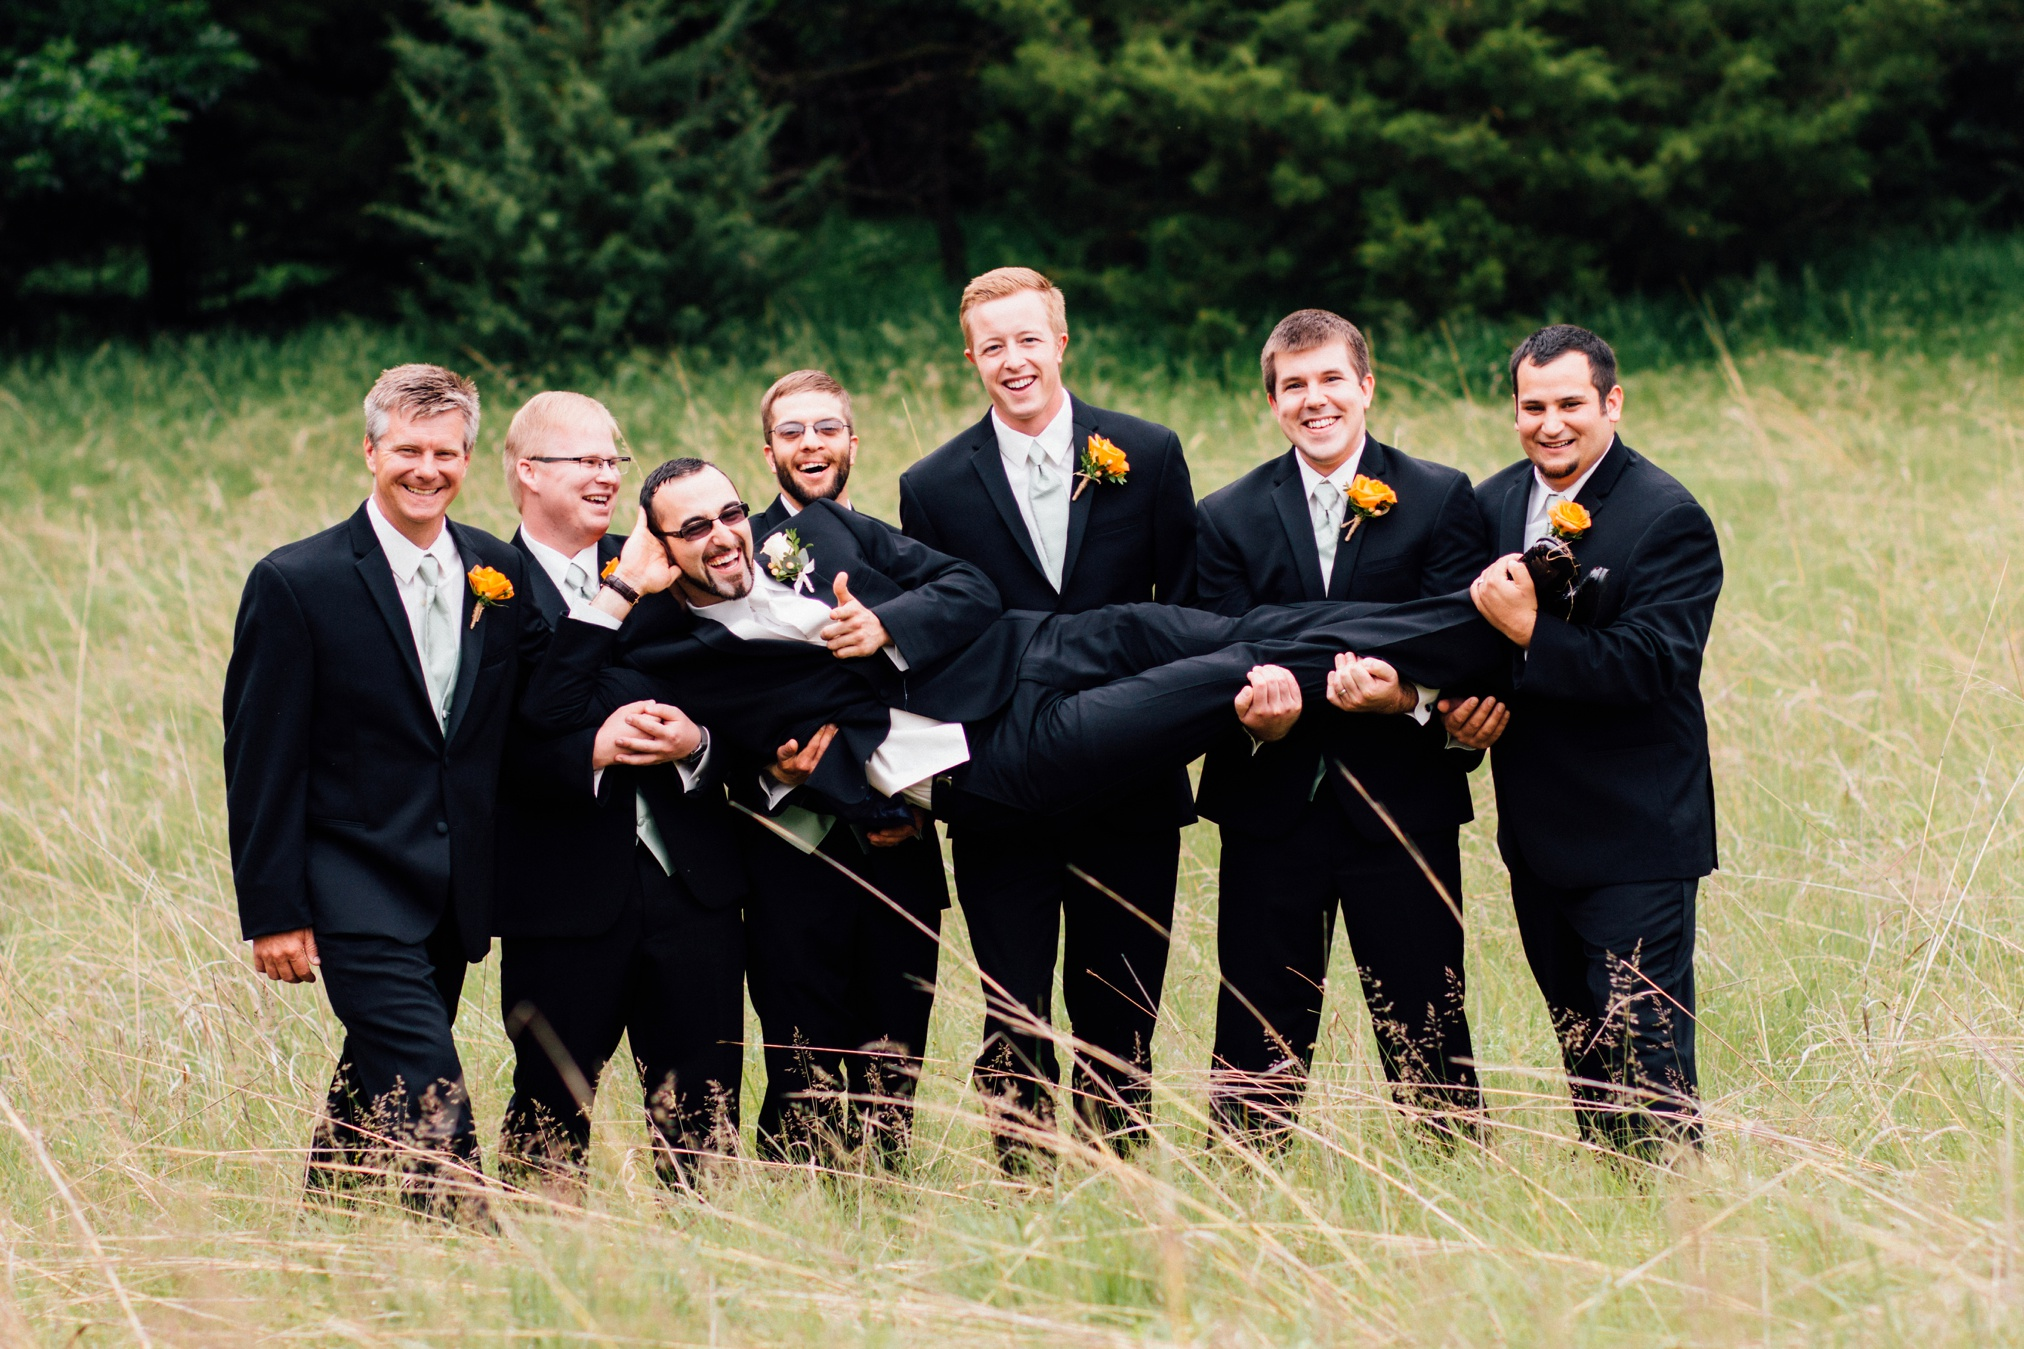 schmid_wedding-232.jpg